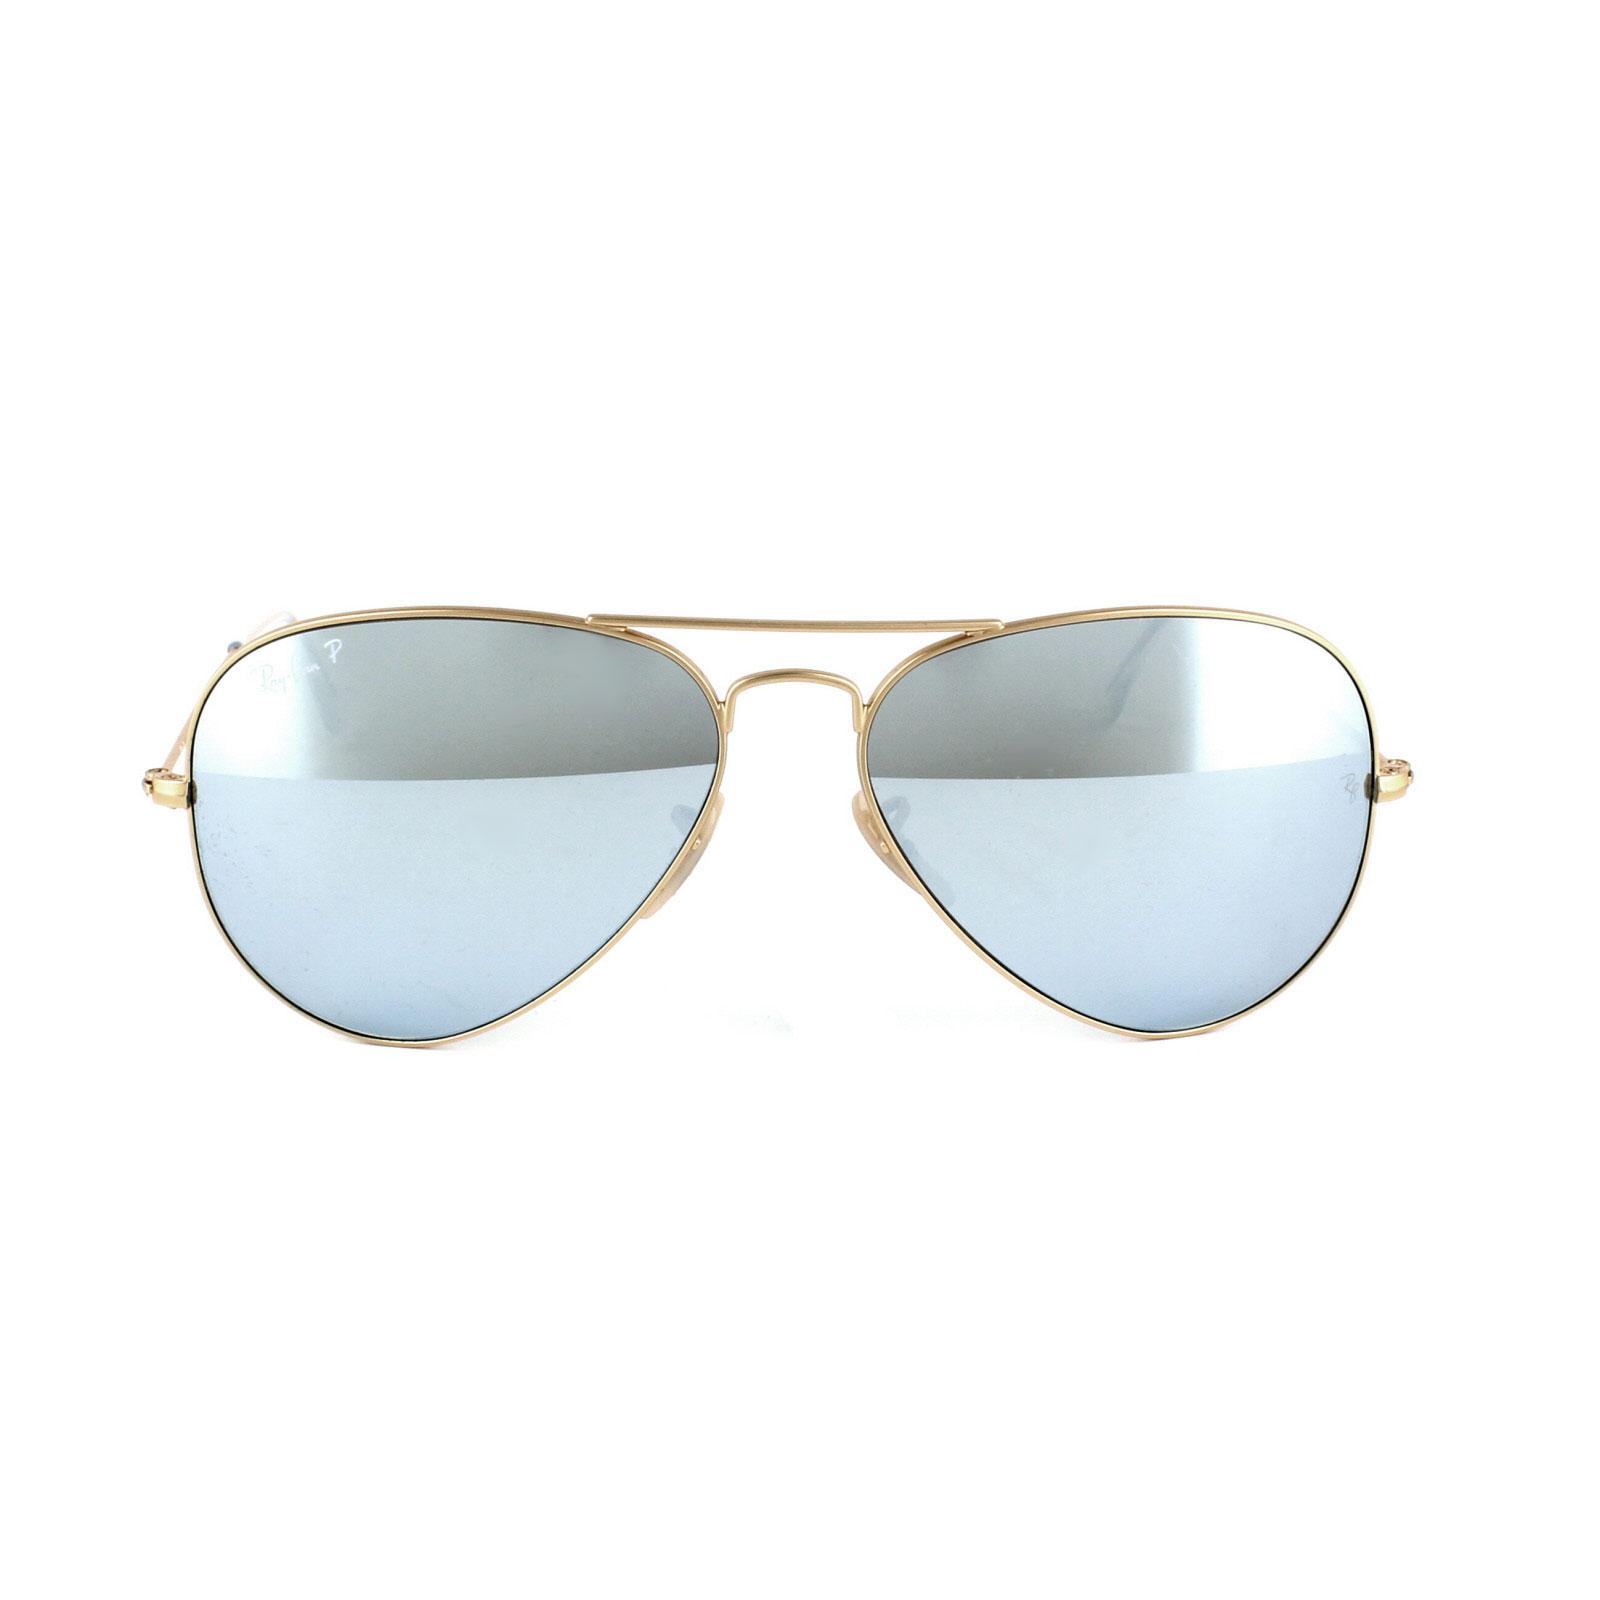 b55deda39f094 ... ebay ray ban sunglasses aviator 3025 112 w3 gold silver mirror  polarized ebay e84d4 223ac